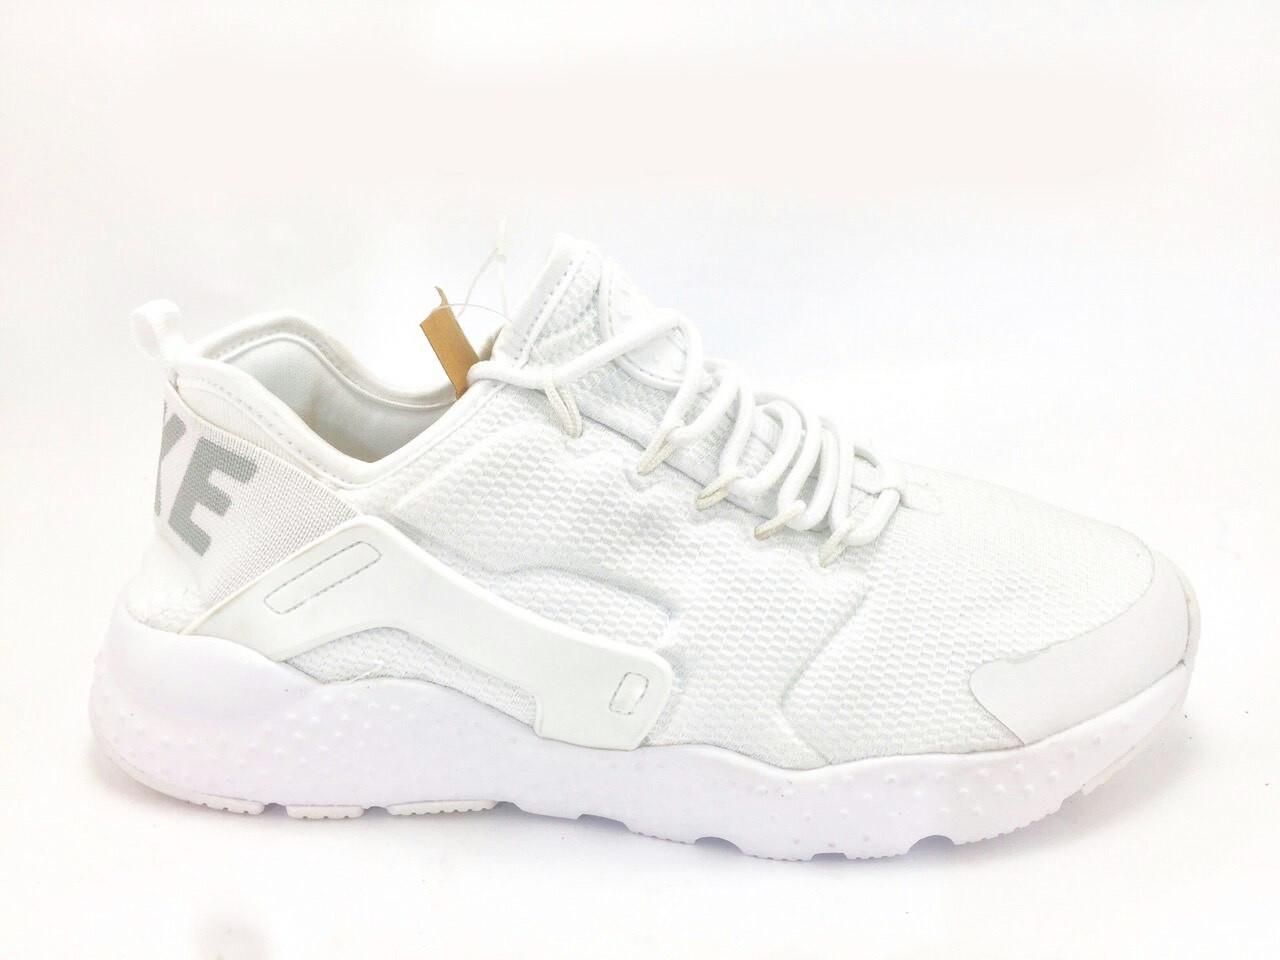 3477ce39 Женские кроссовки Nike Huarache белые 1917, цена 845,01 грн., купить ...